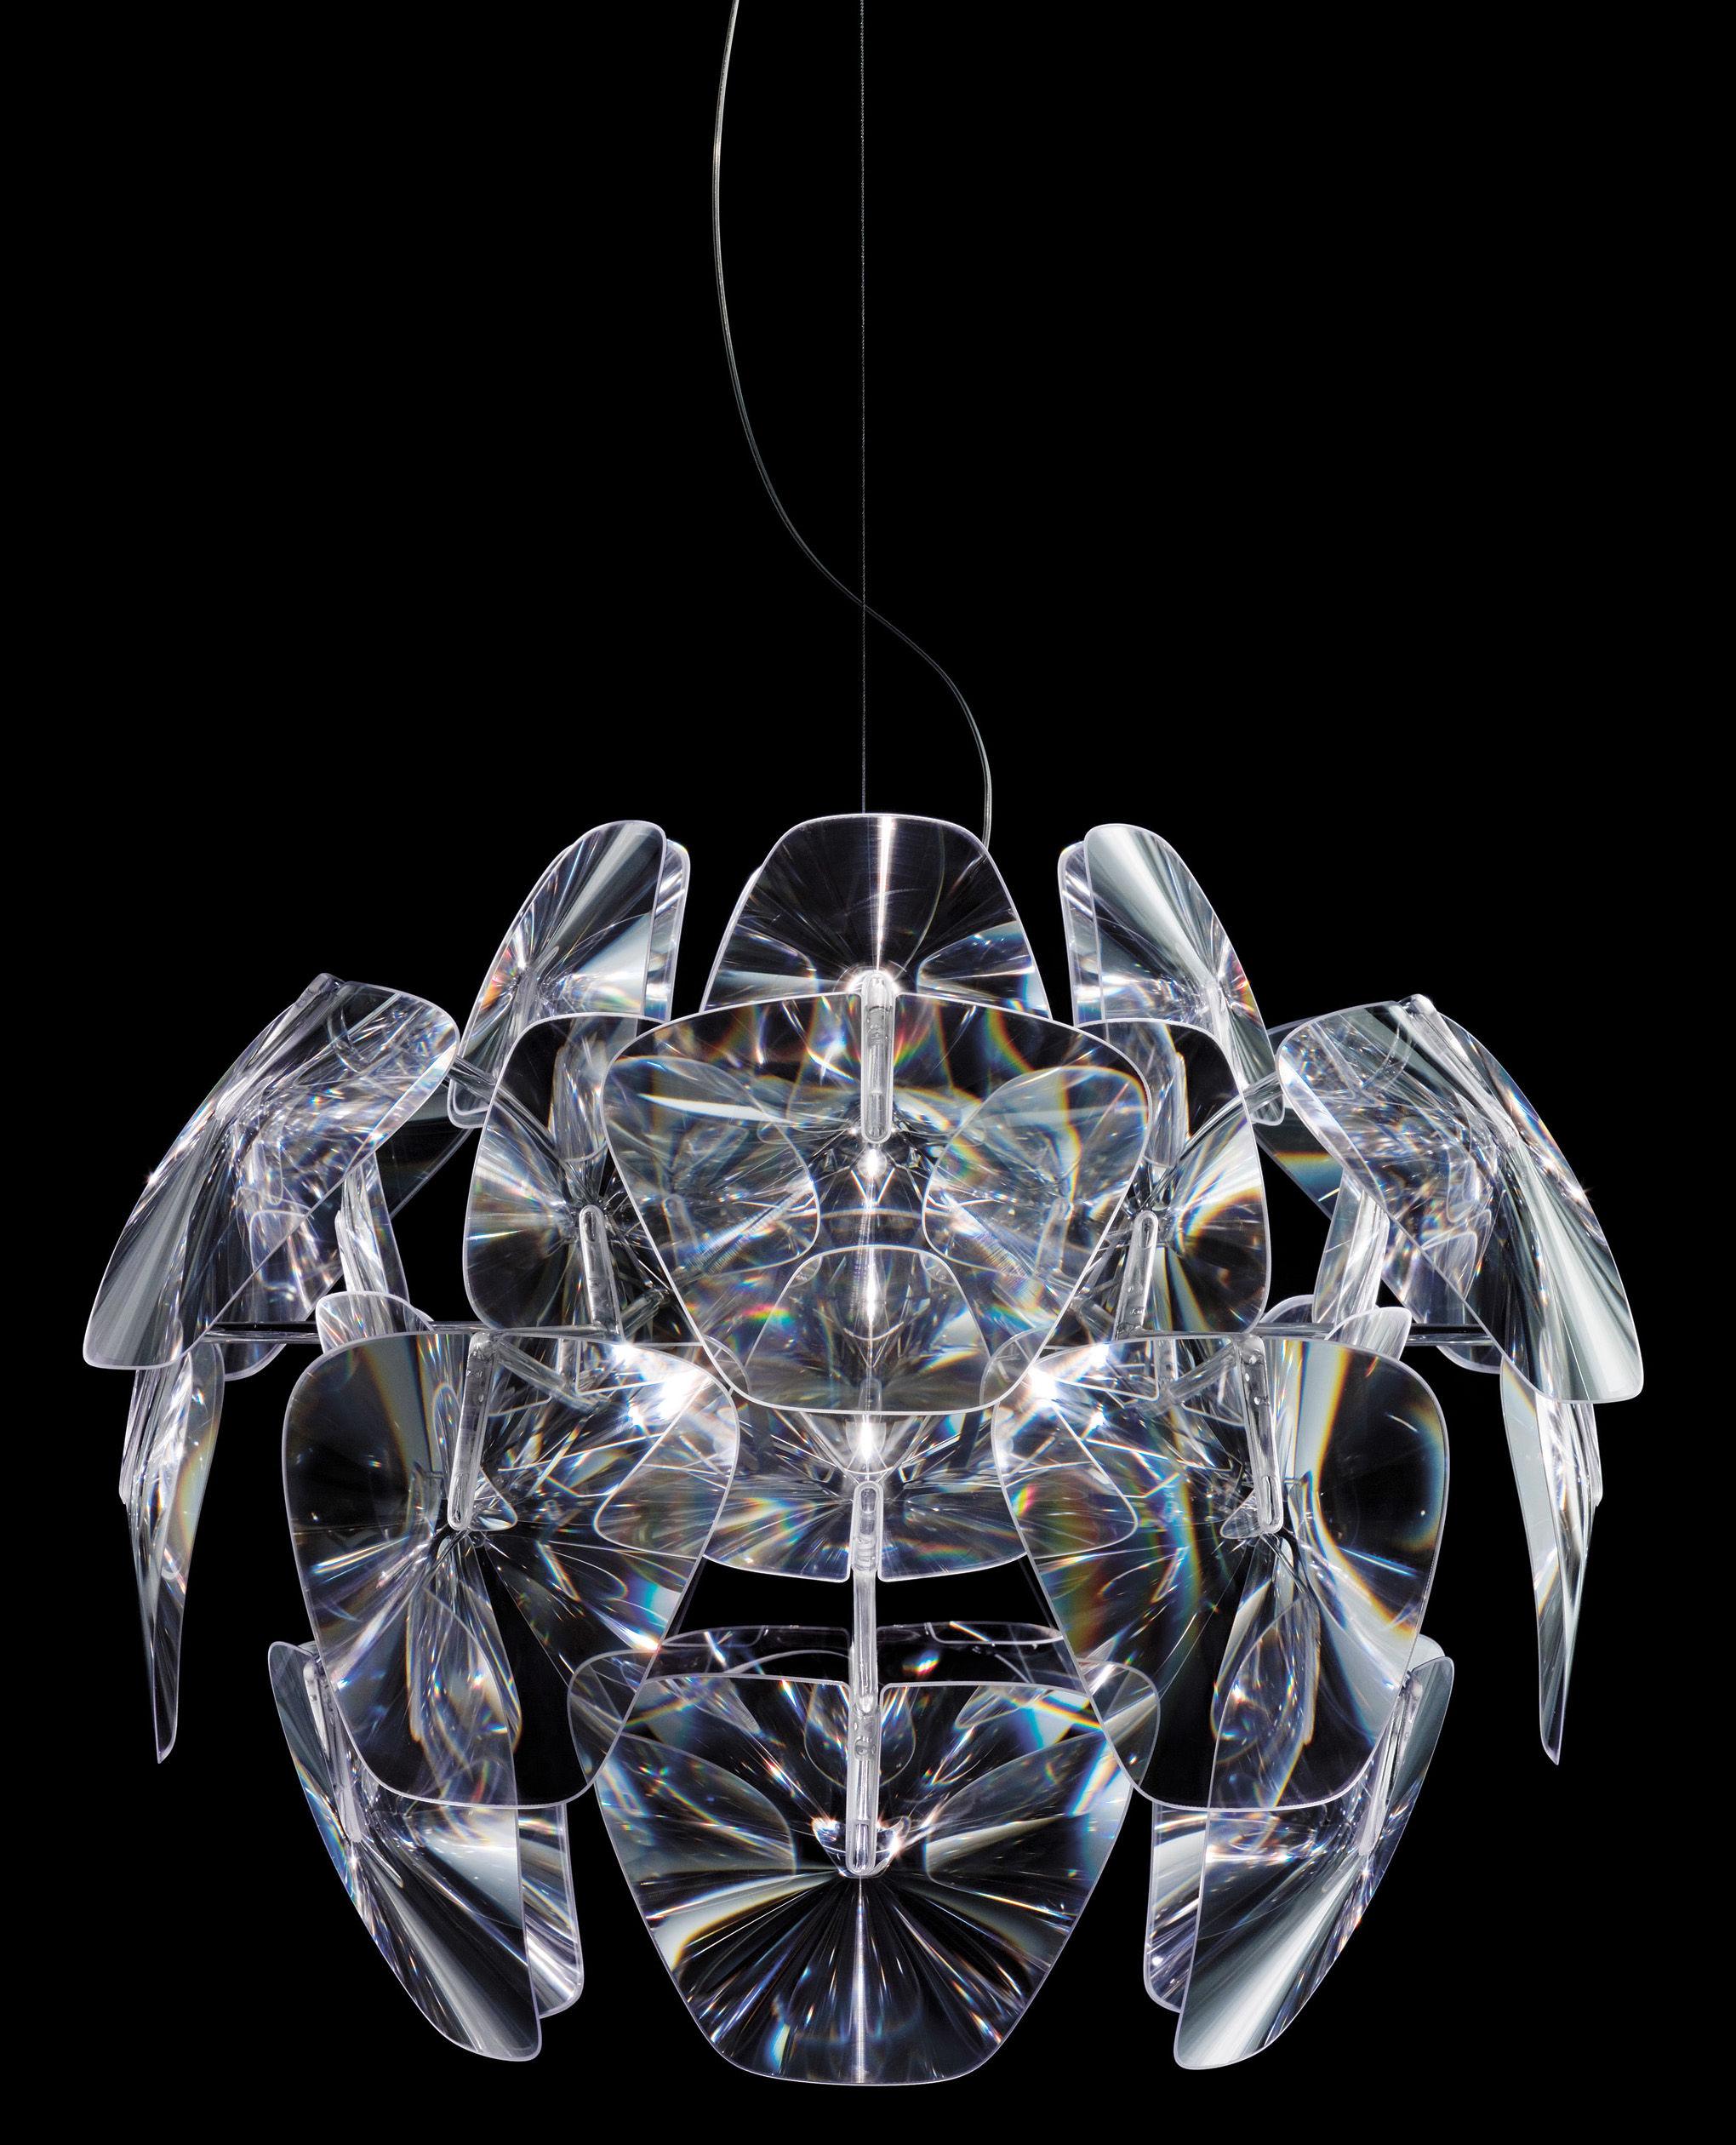 Illuminazione - Lampadari - Sospensione Hope di Luceplan - Ø 61 cm - Trasparente - policarbonato